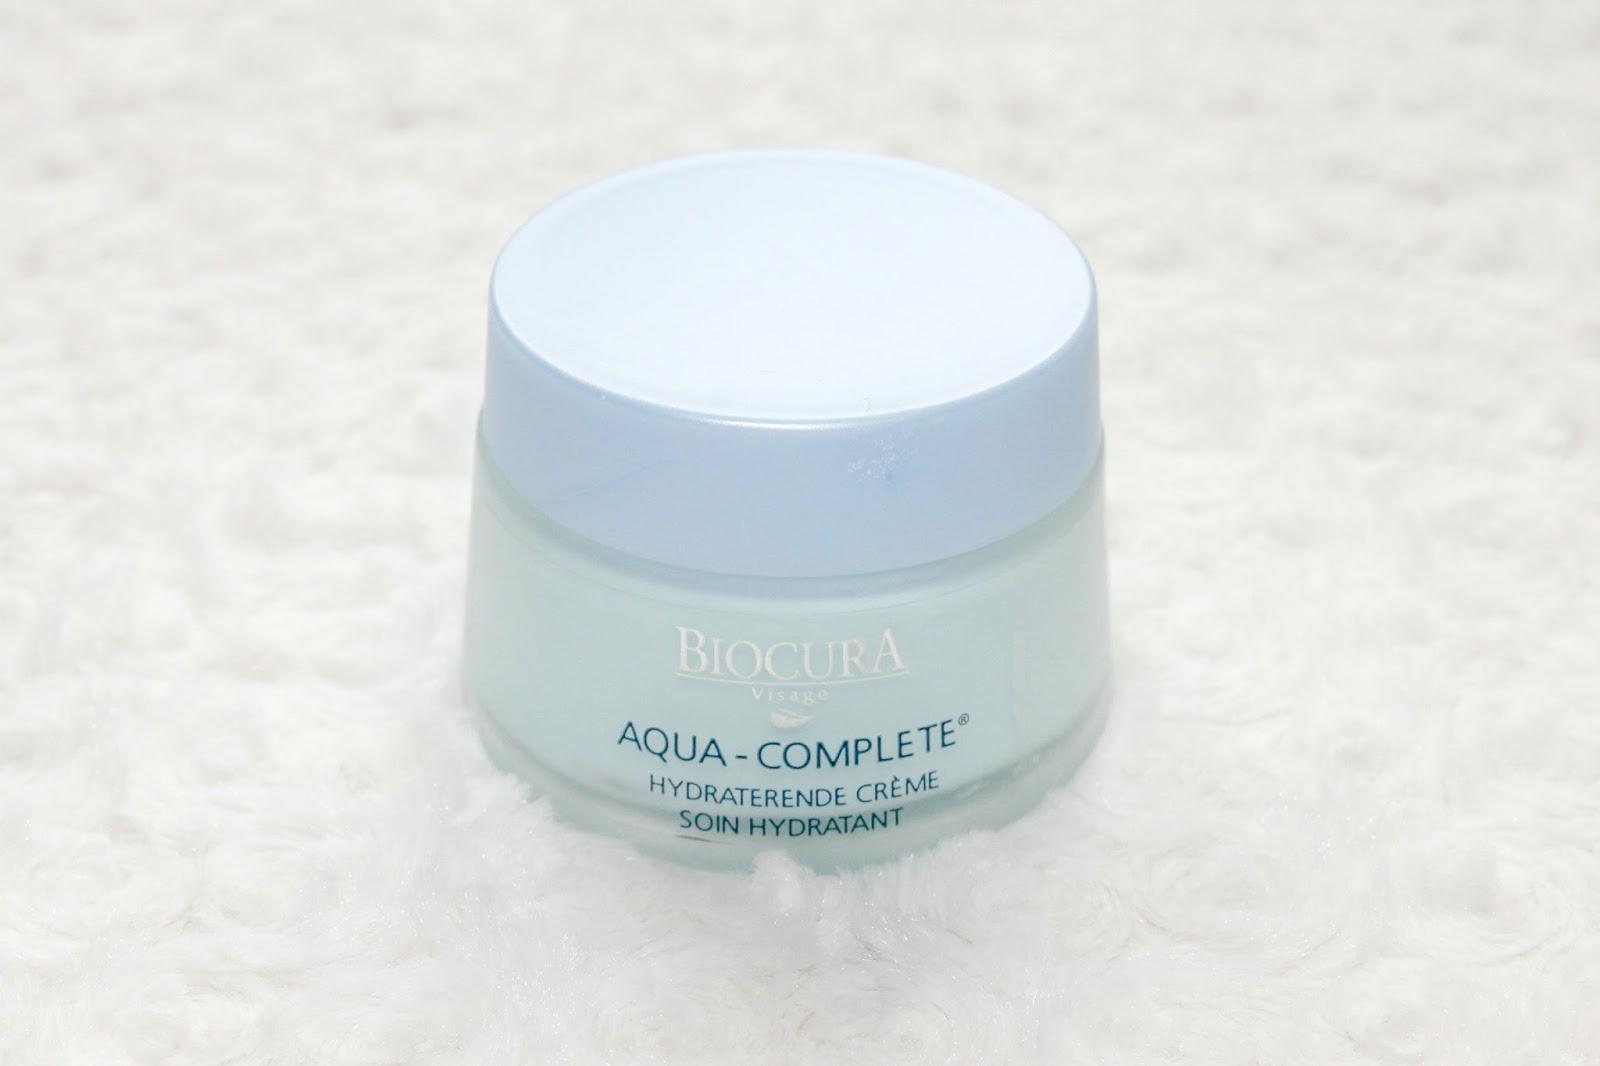 biocura aqua-complete hydraterende crème